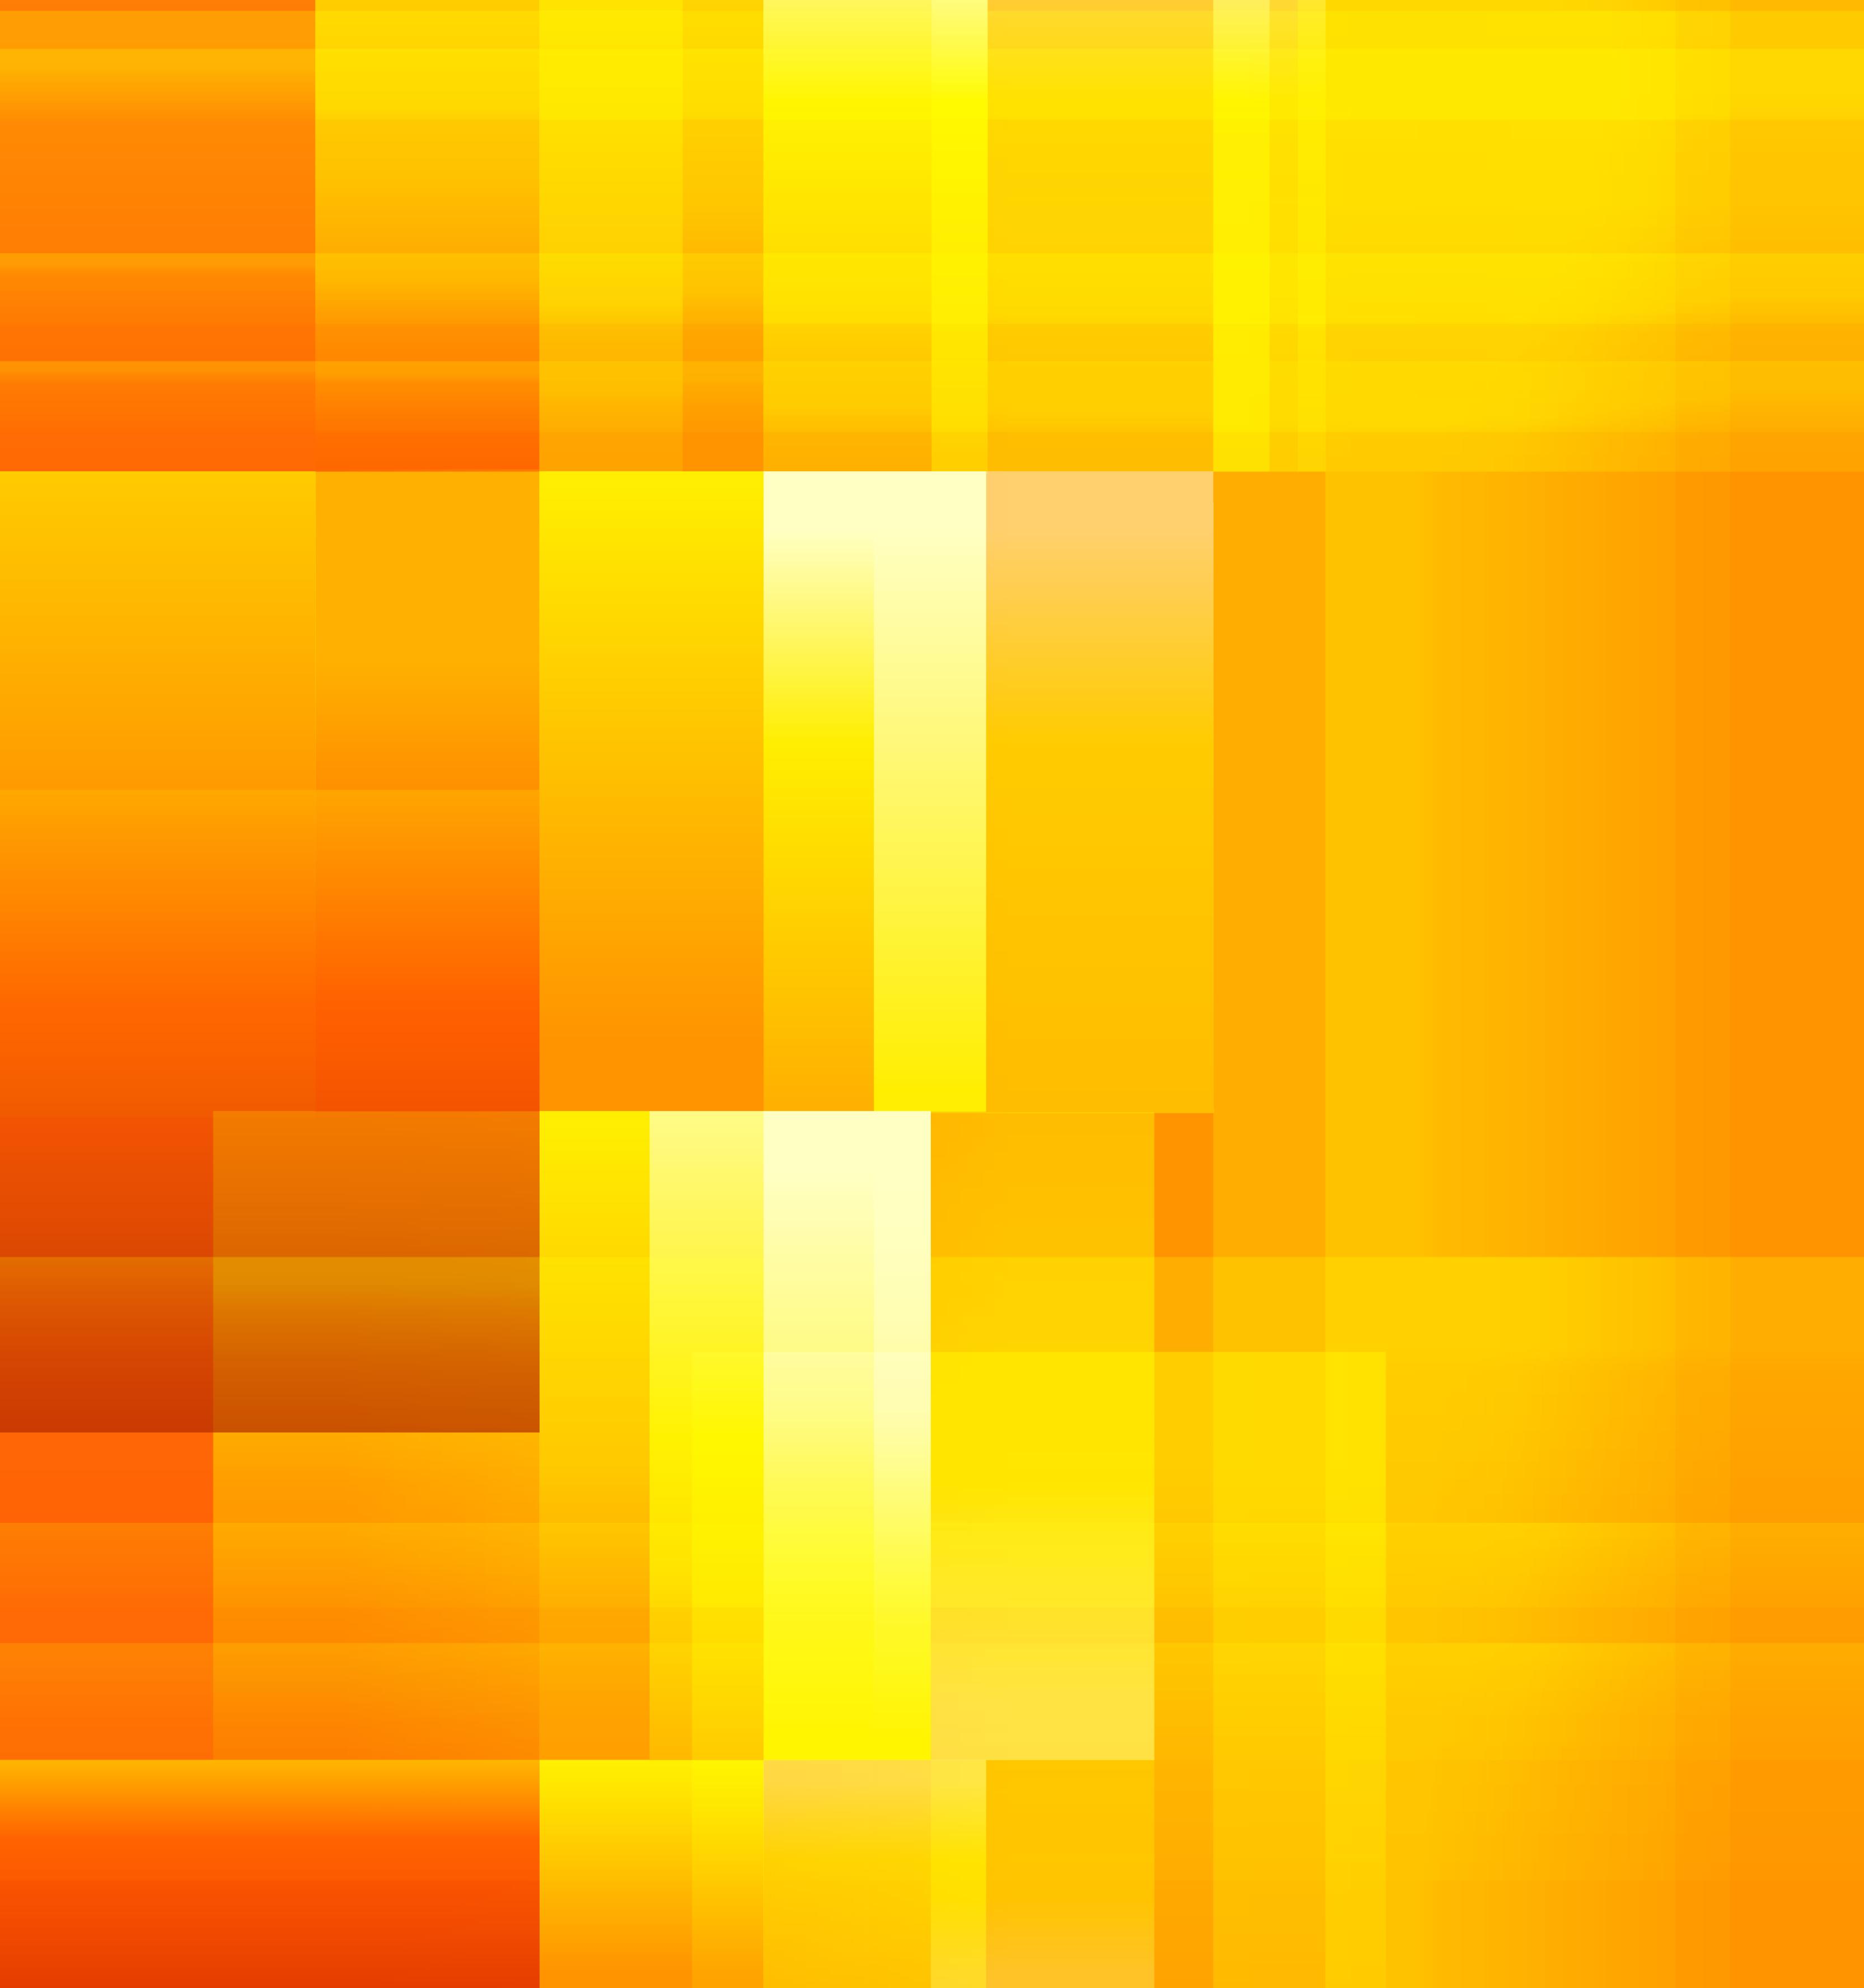 Желтые и оранжевые фоны: http://gif-kartinki.ru/zheltye-fony.html